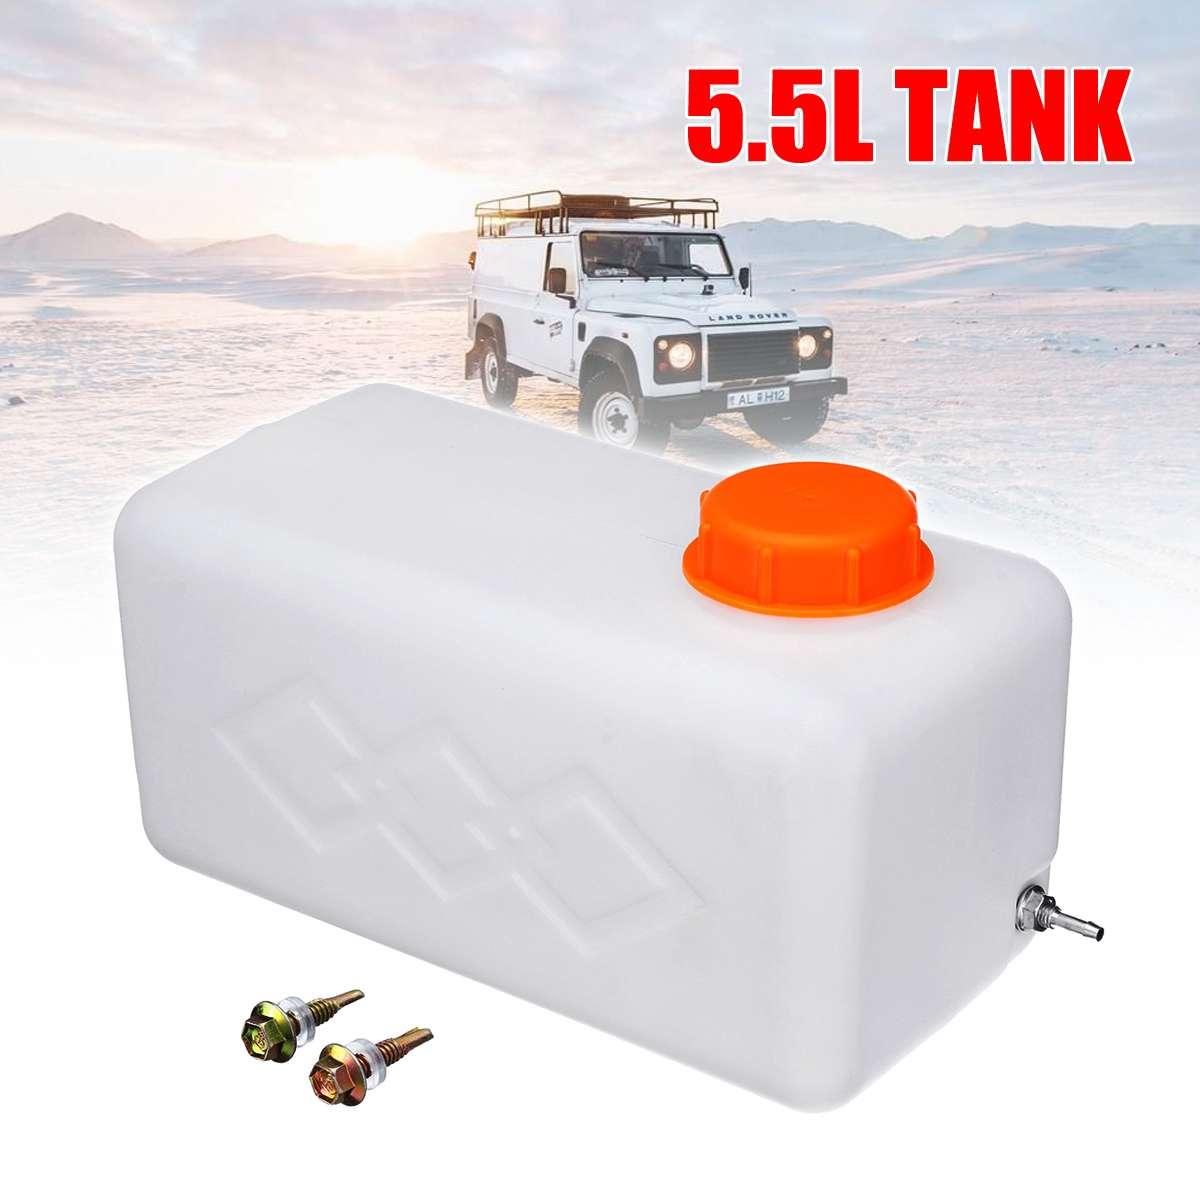 דלק טנק 5.5L שמן בנזין דיזלים בנזין פלסטיק Storge מיכל מים טנק סירת רכב משאית חניה דוד אביזרים